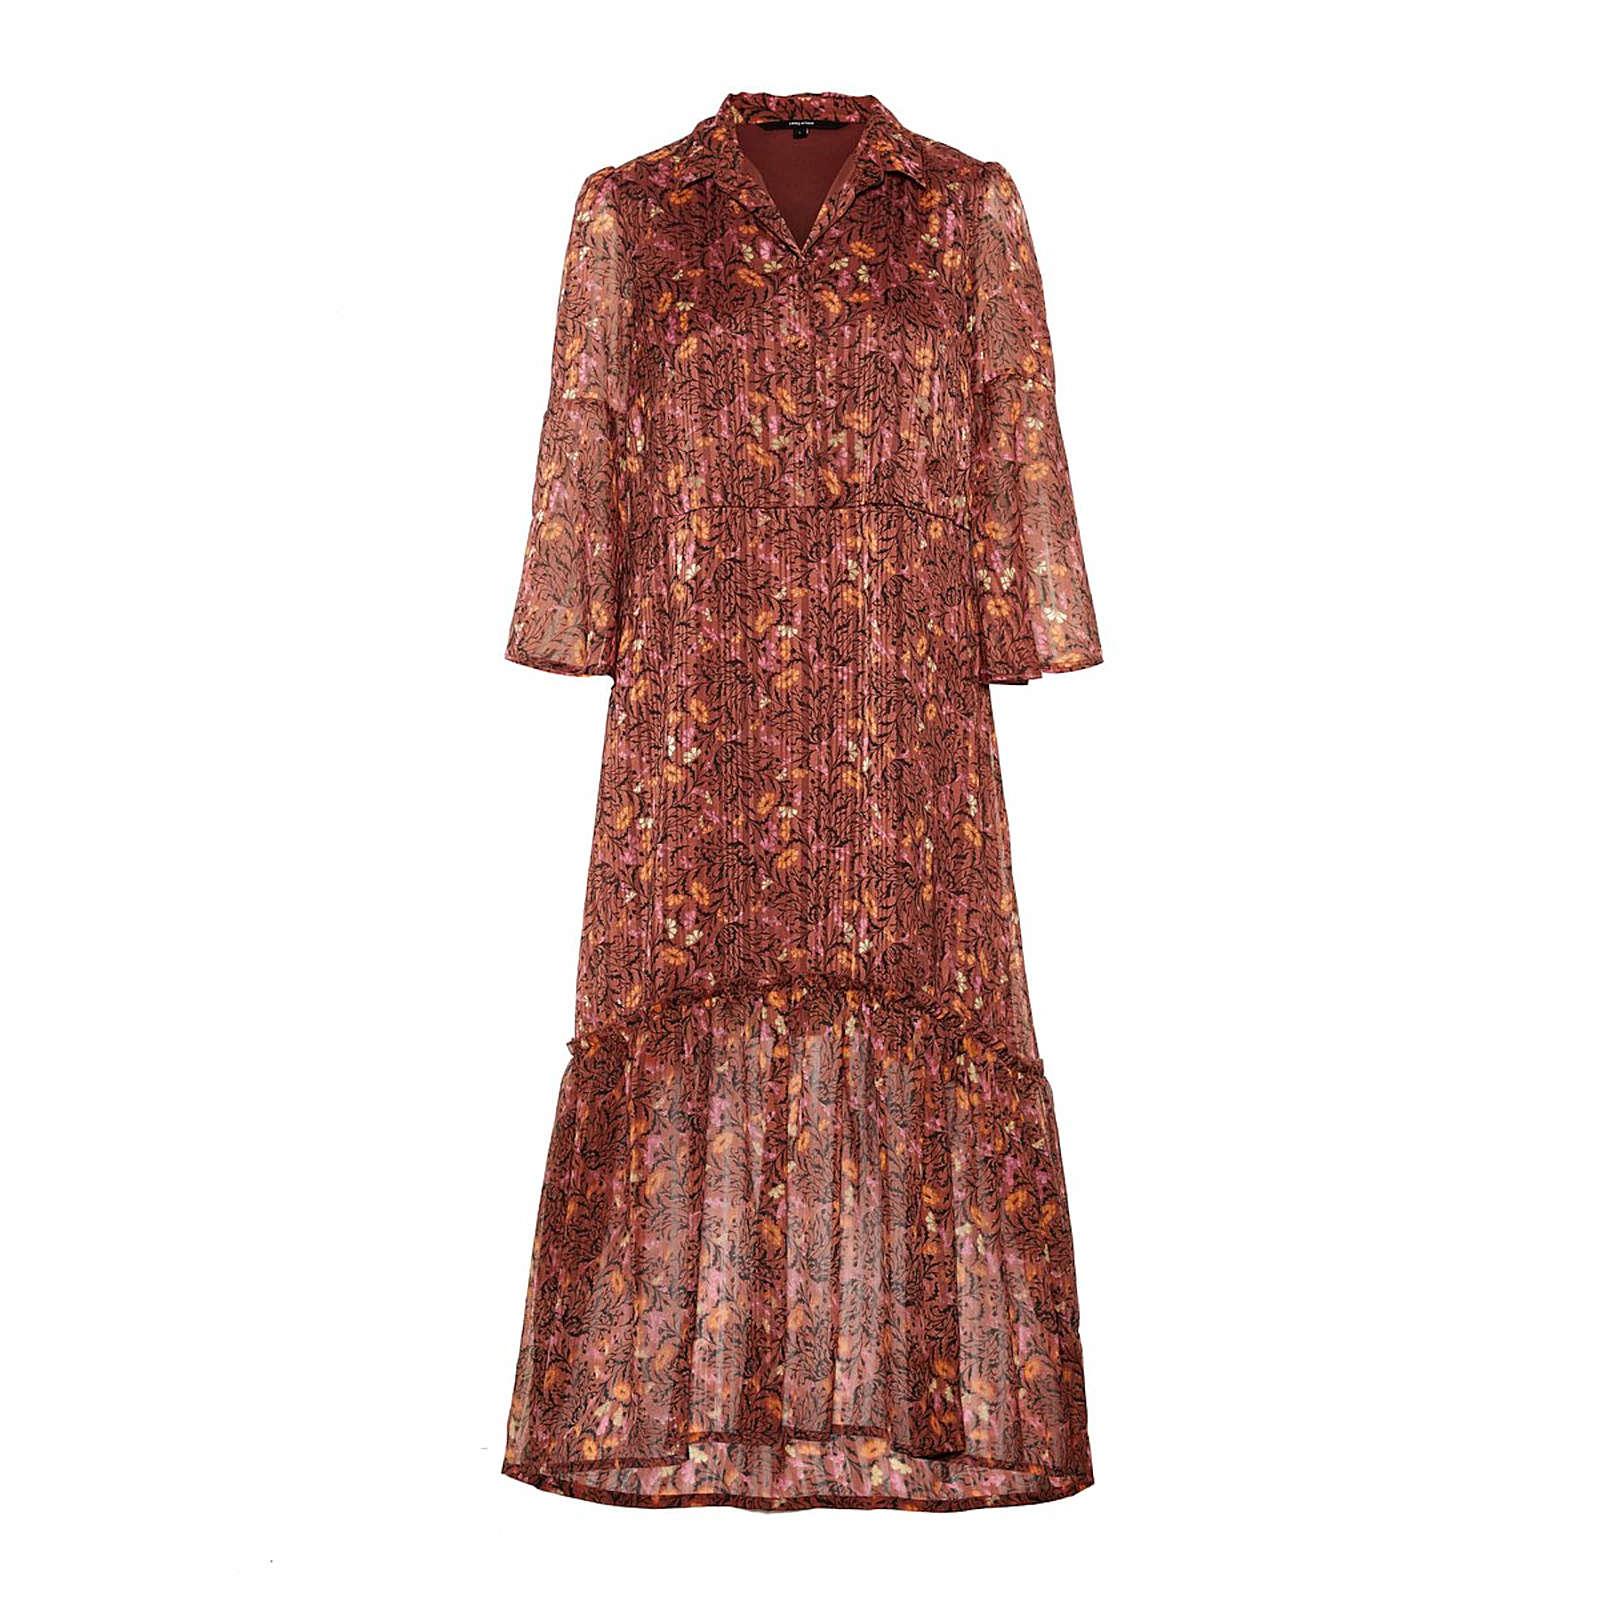 VERO MODA Blusenkleid Blusenkleider braun Damen Gr. 38